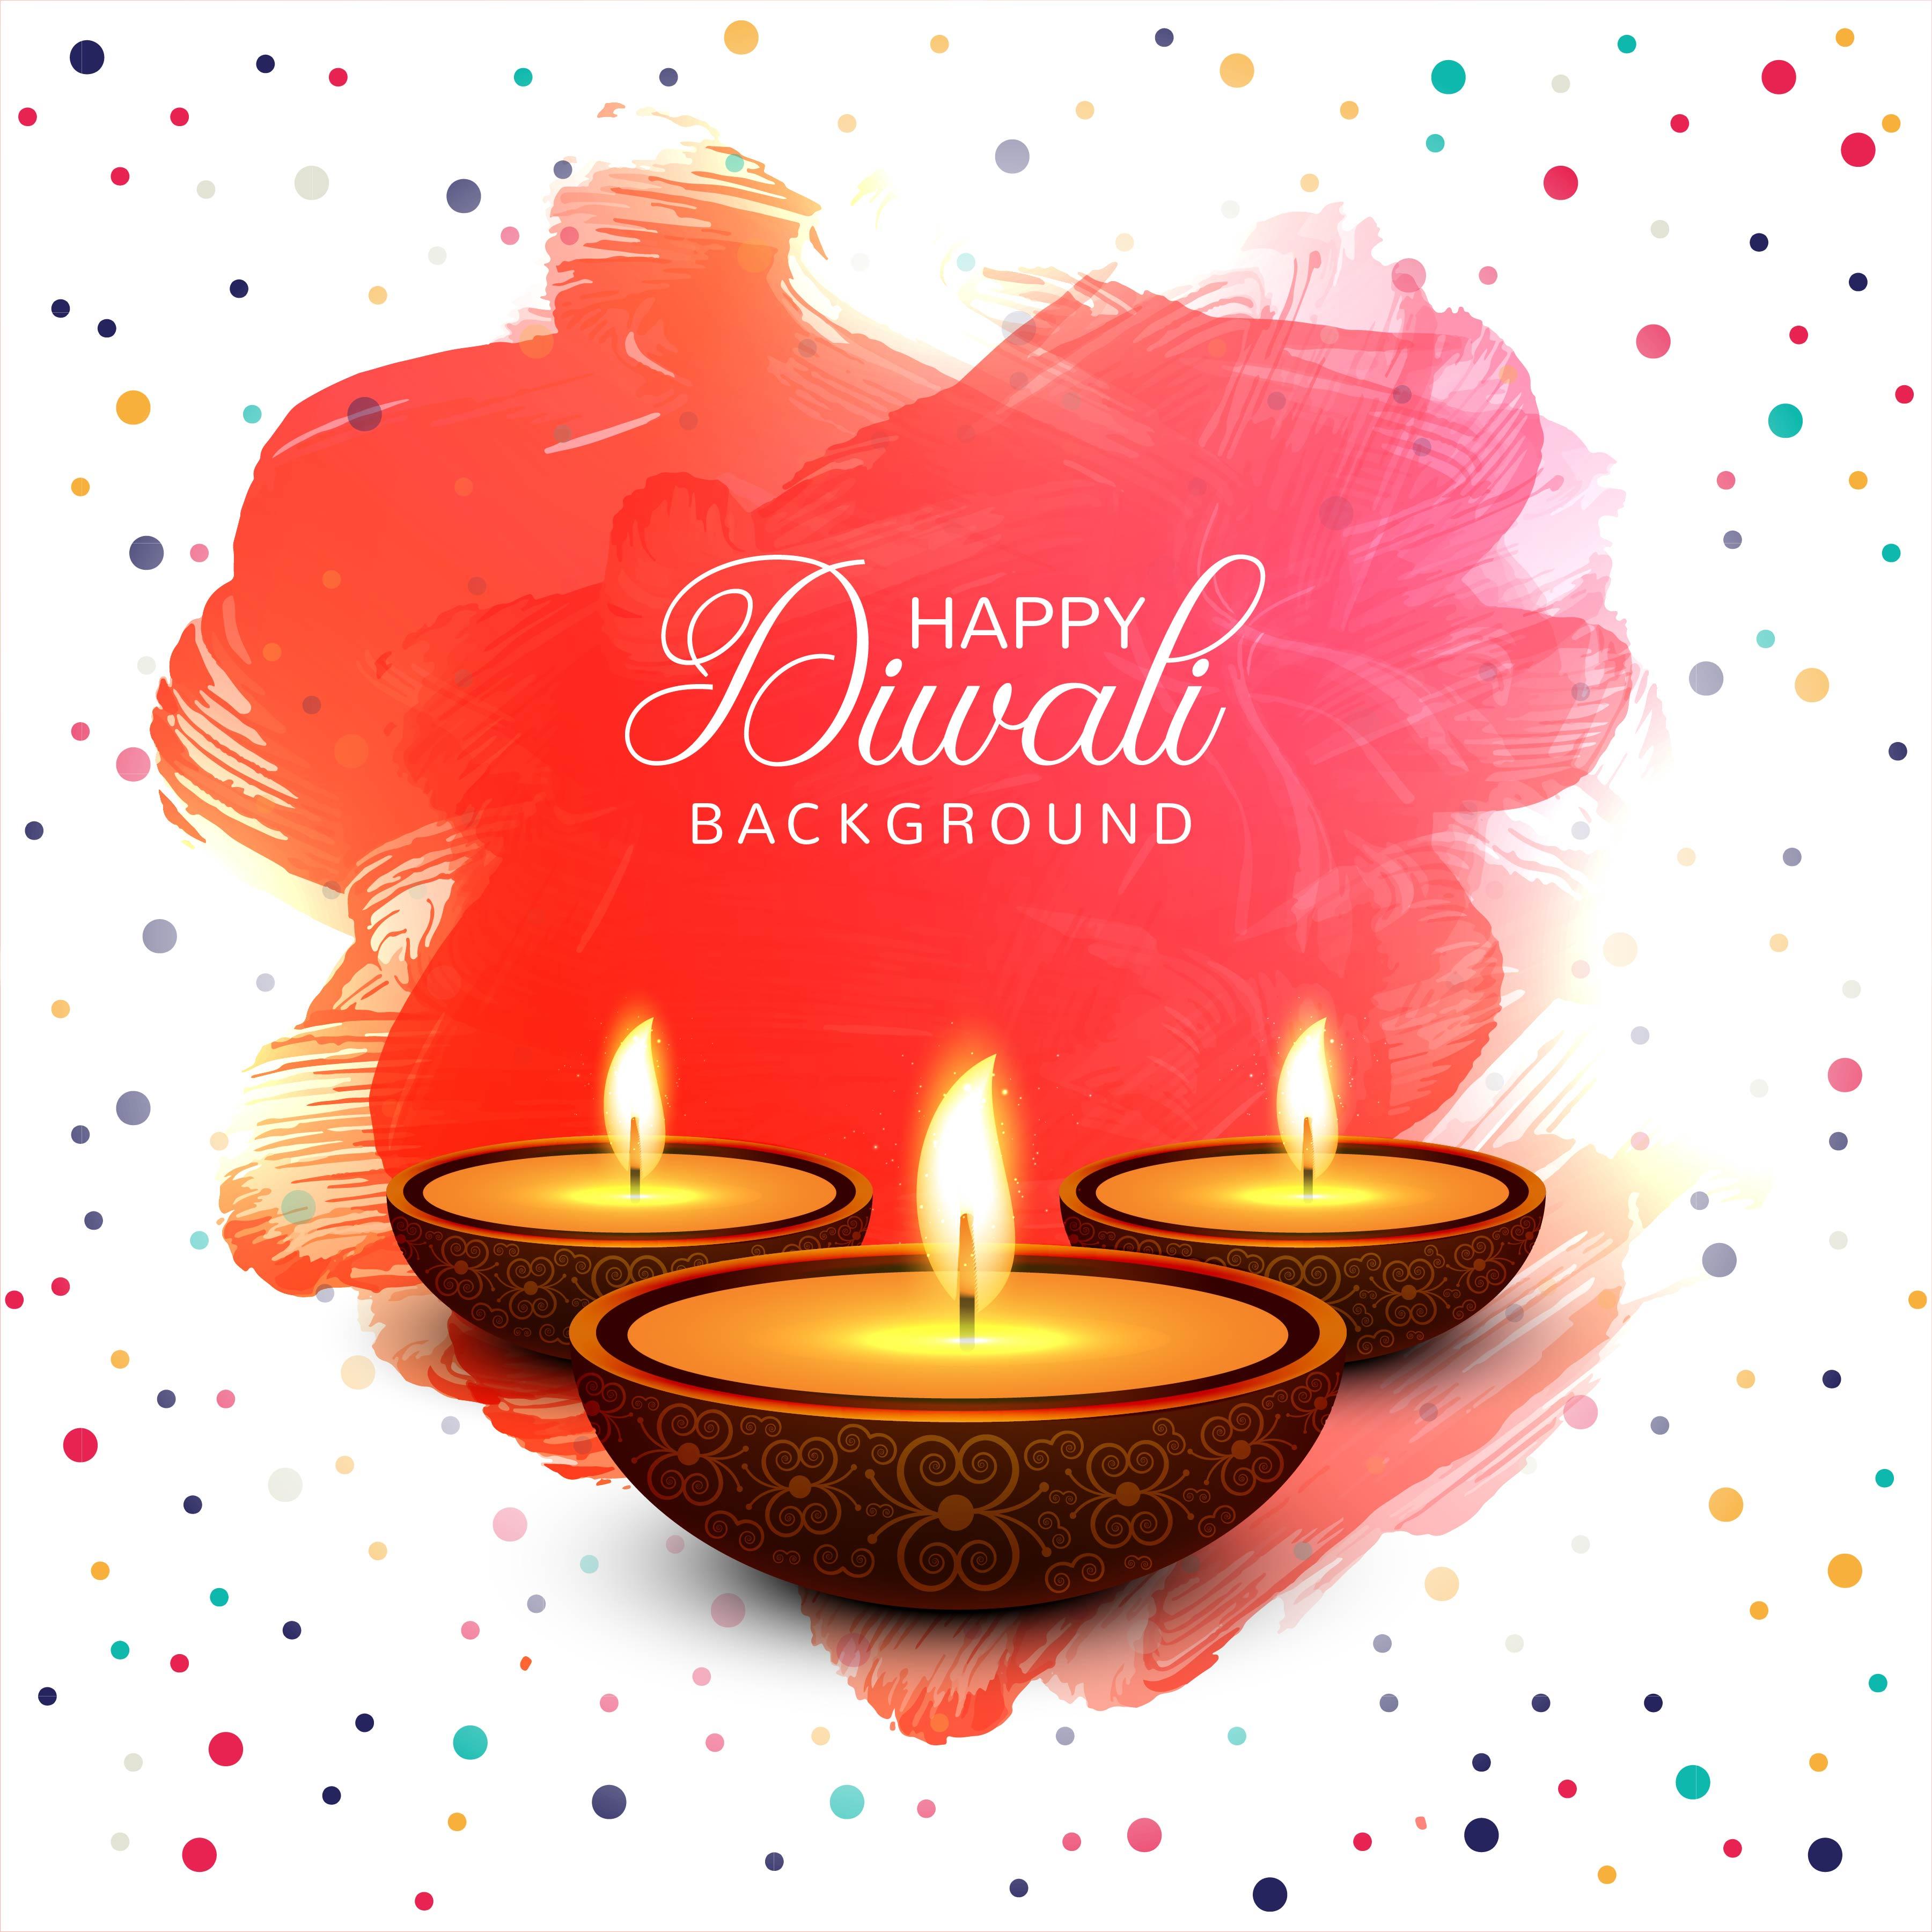 Happy Diwali Diya Oil Lamp Festival Colorful Card